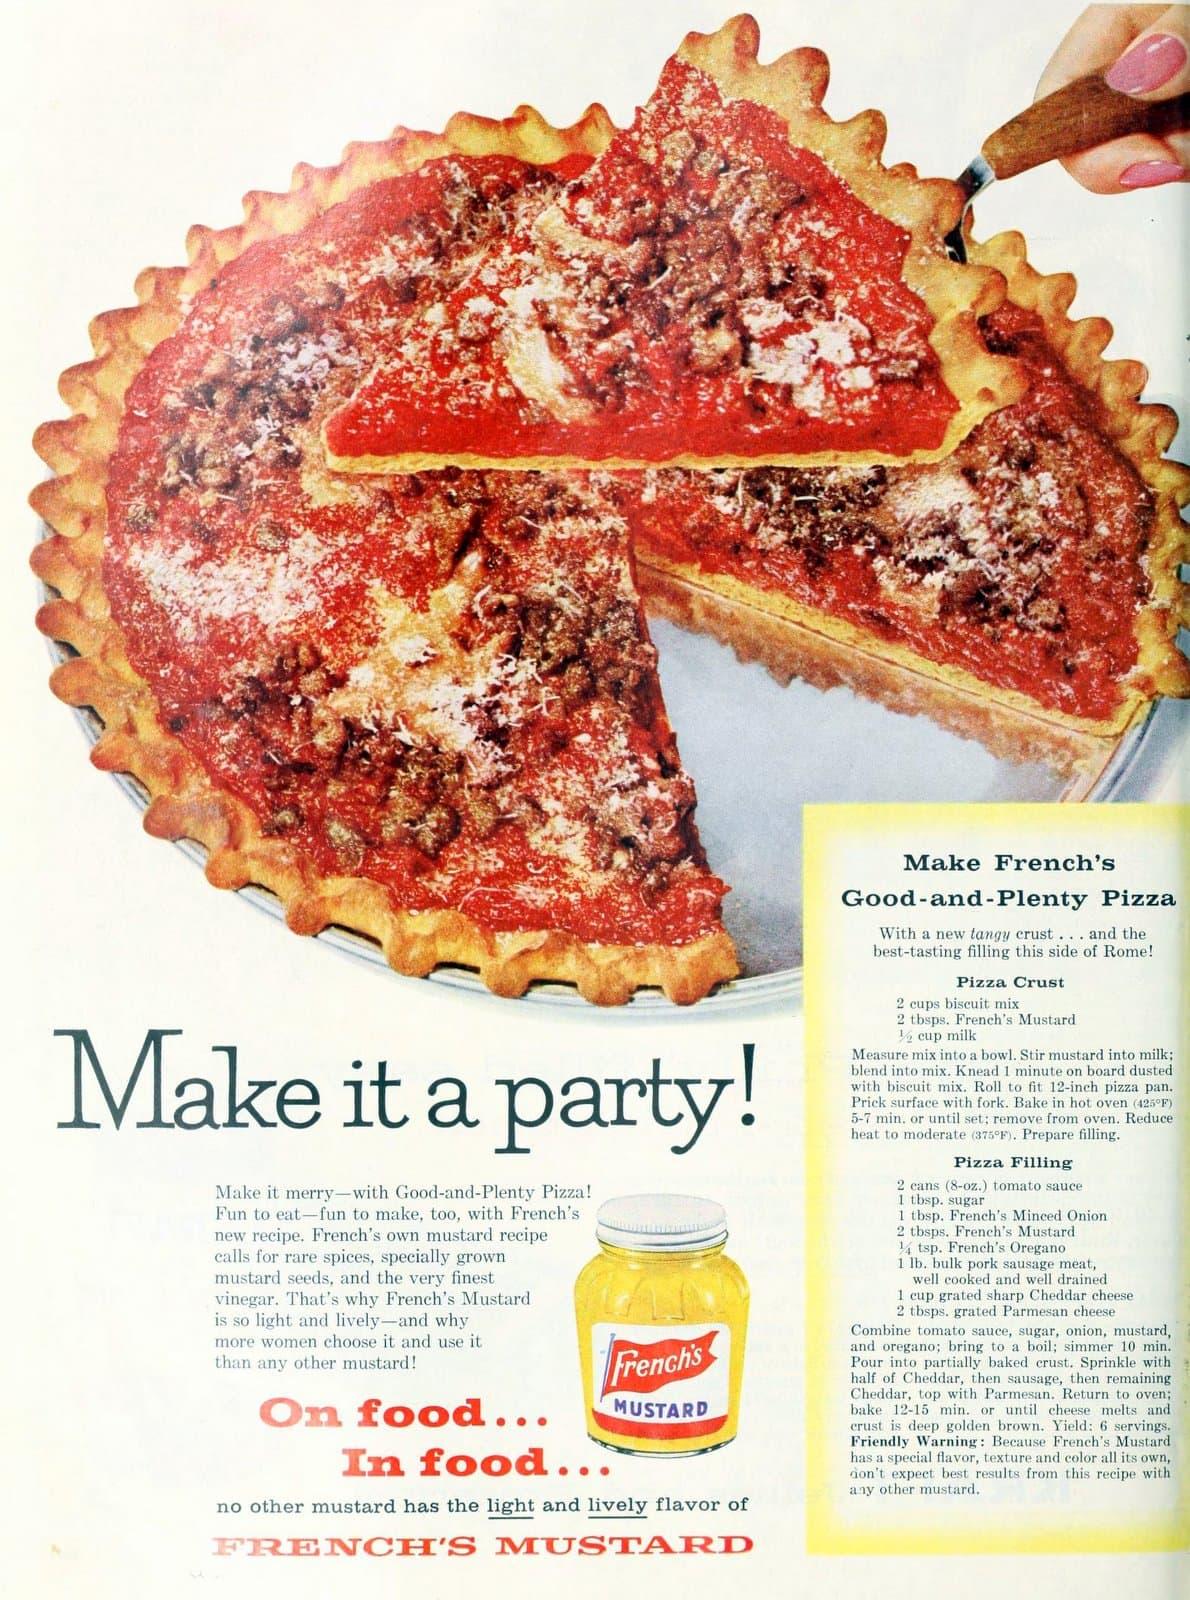 Make French's Good and Plenty Pizza (1958)